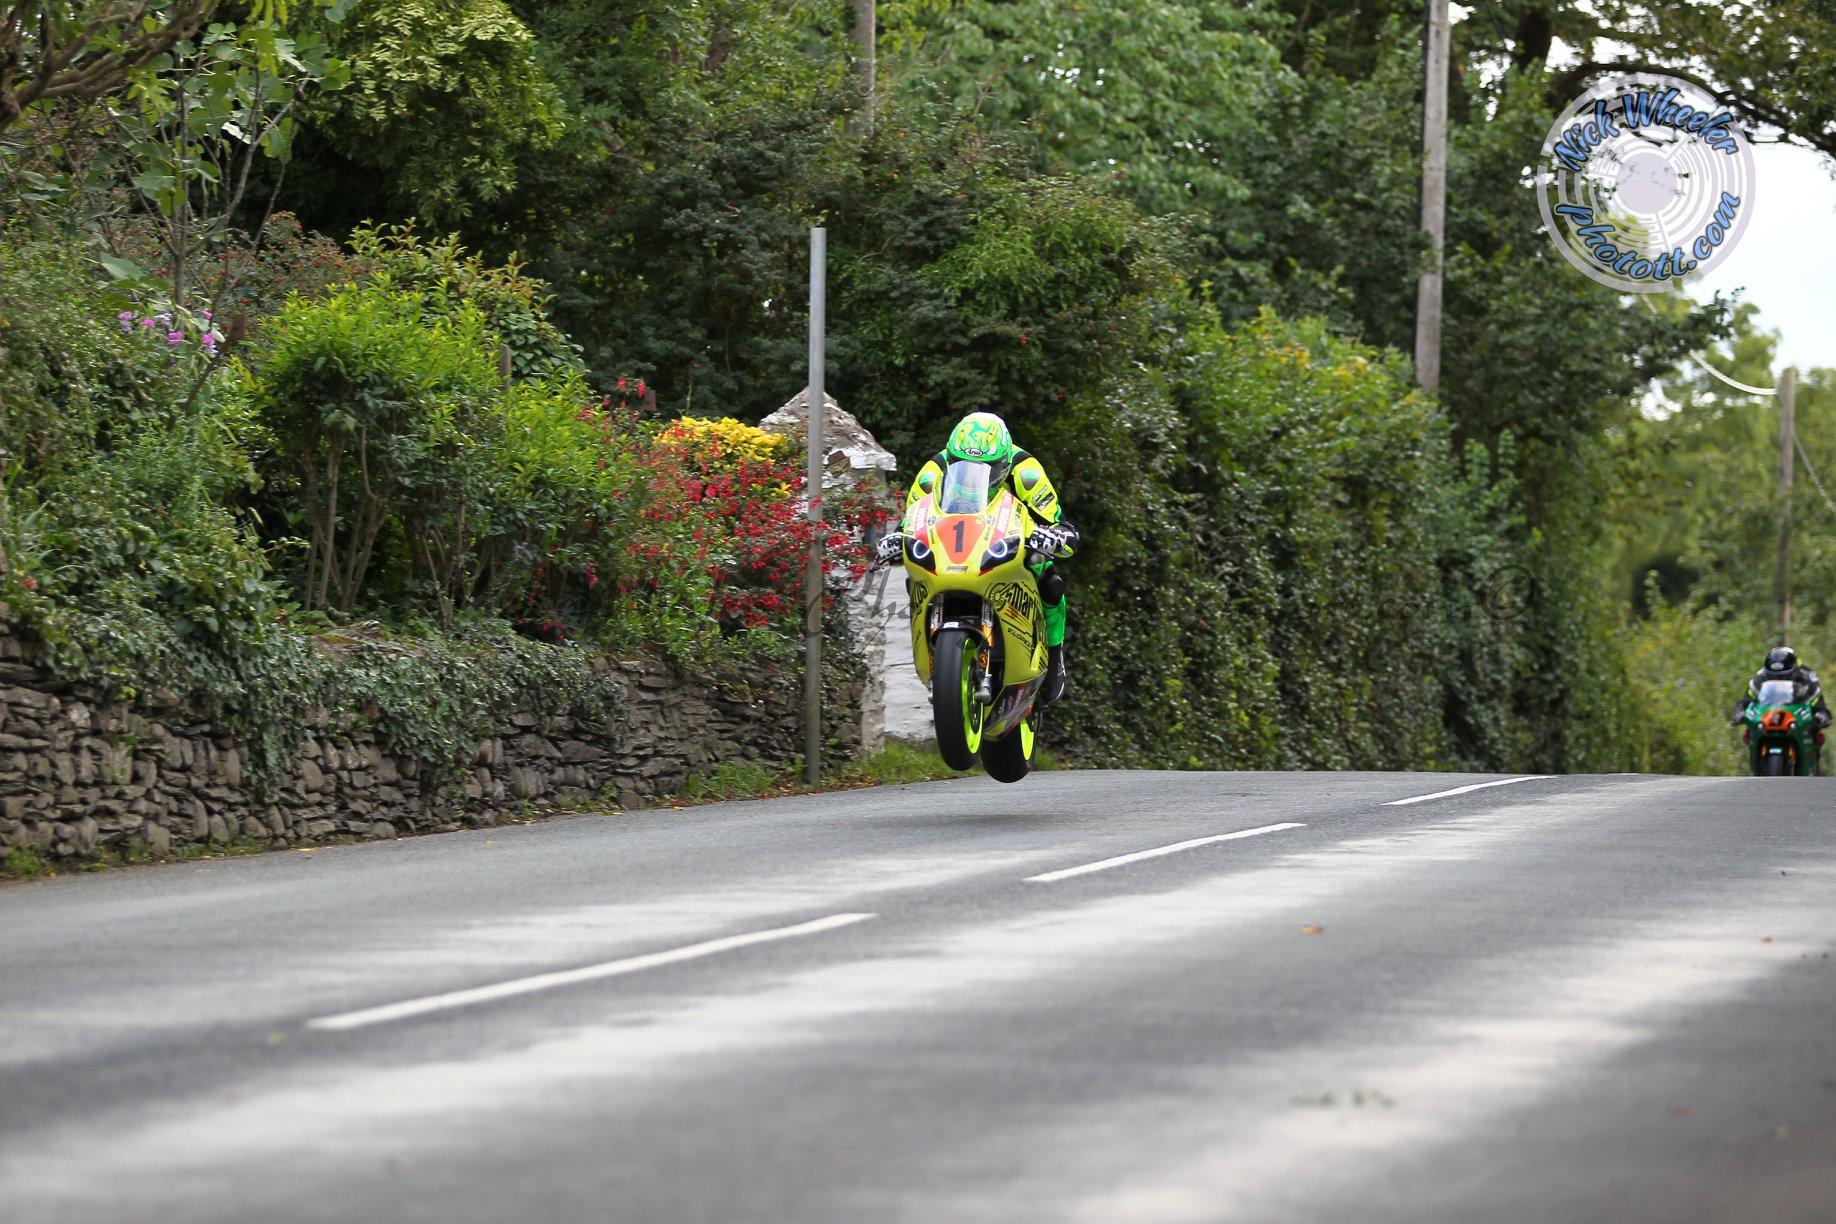 Manx Grand Prix: Friday Evening Practice Report